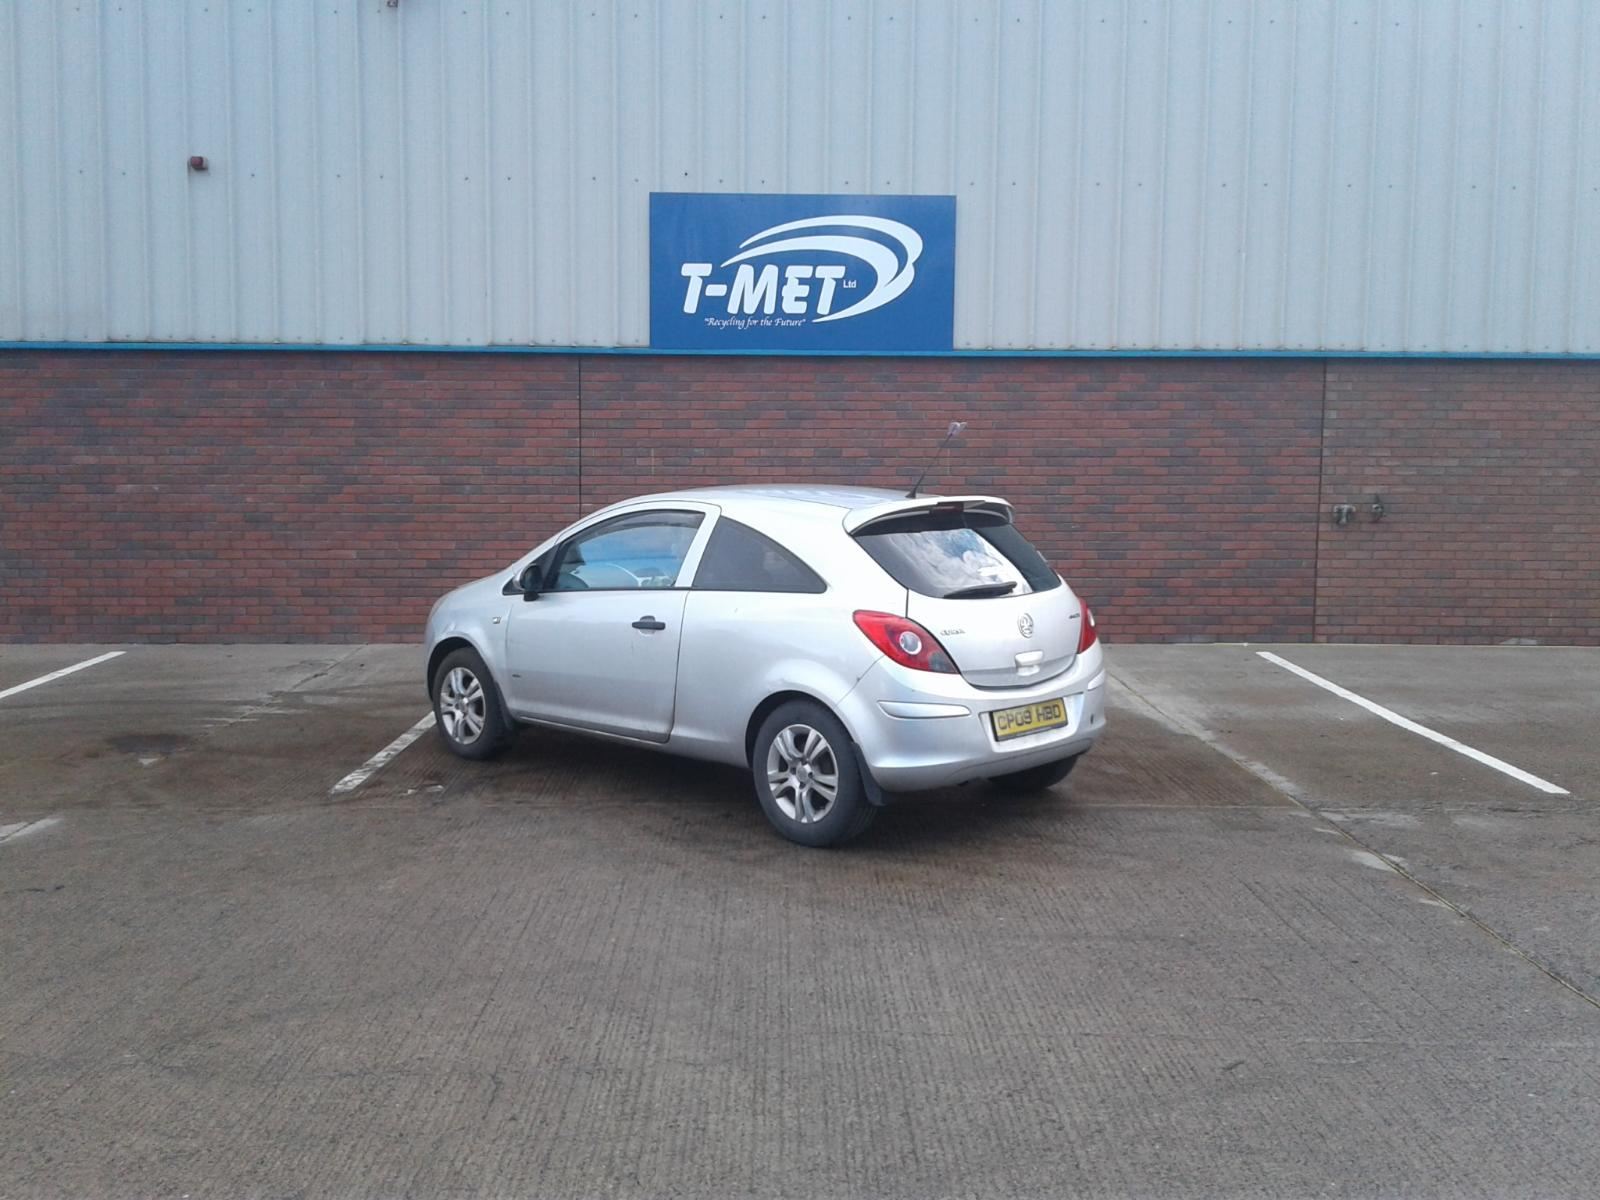 2009 Vauxhall CORSA ACTIVE CDTI Image